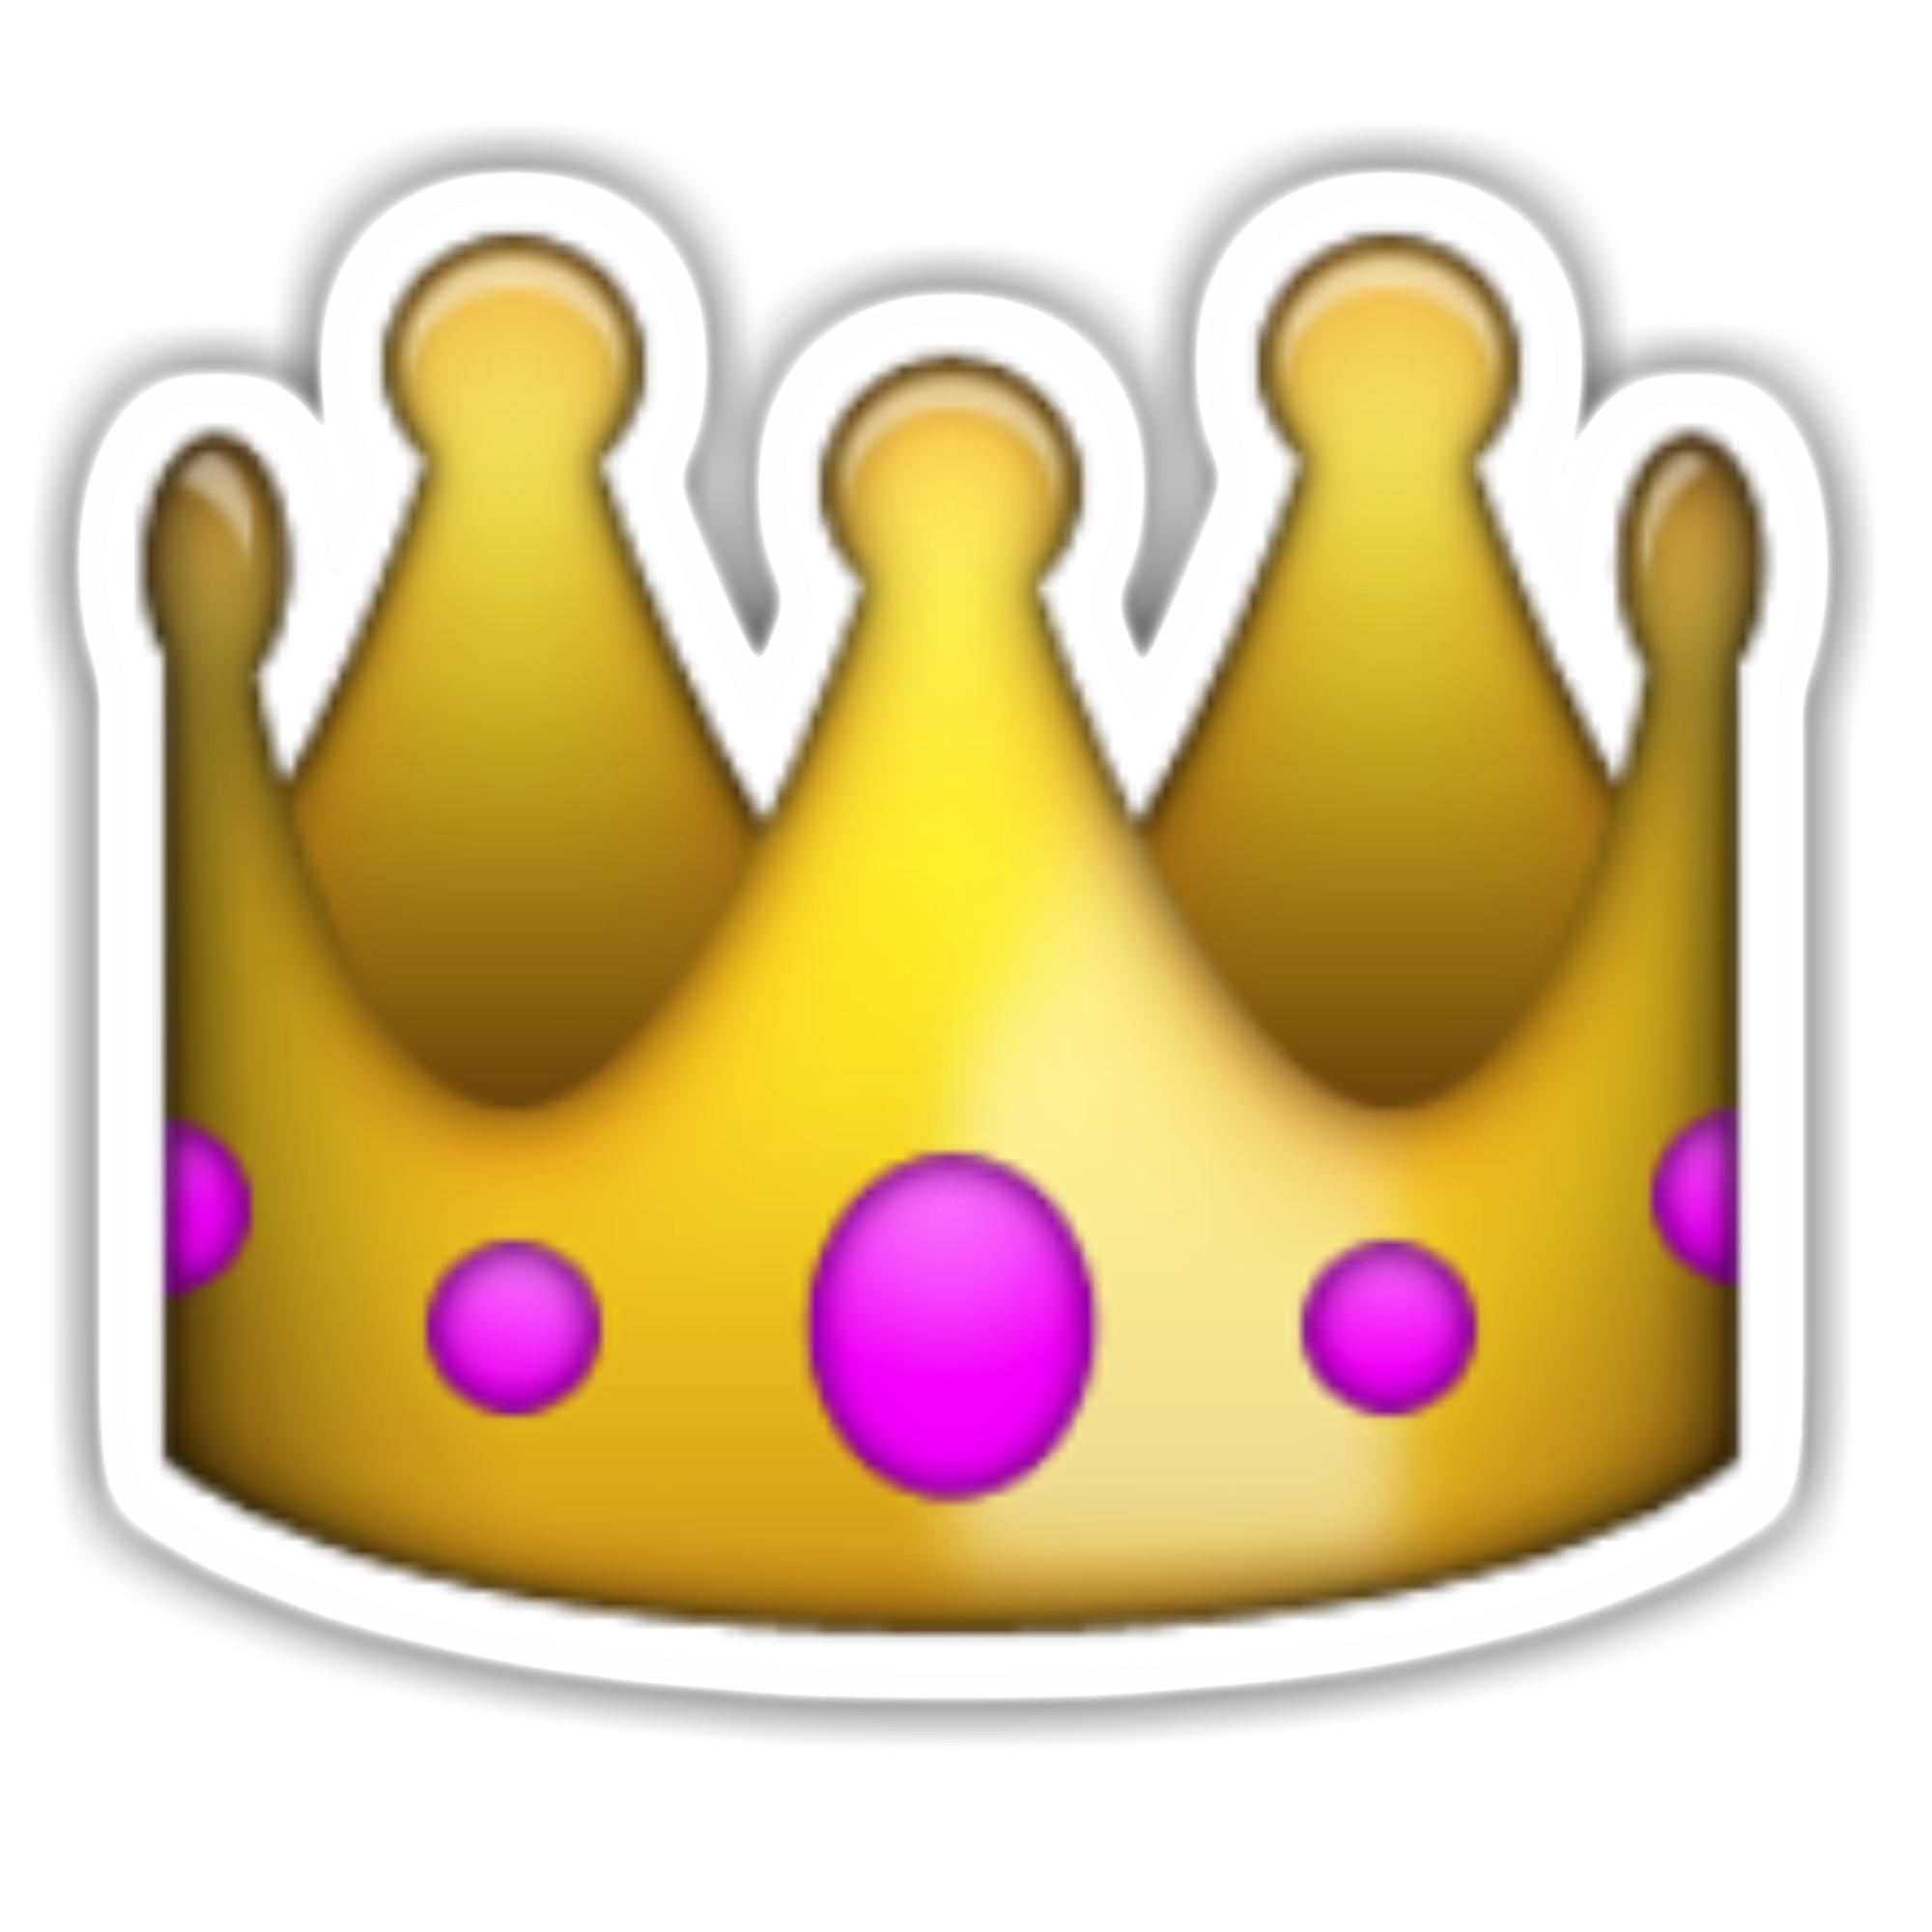 2000x2000 Emoji Stickers Related Keywords Suggestions